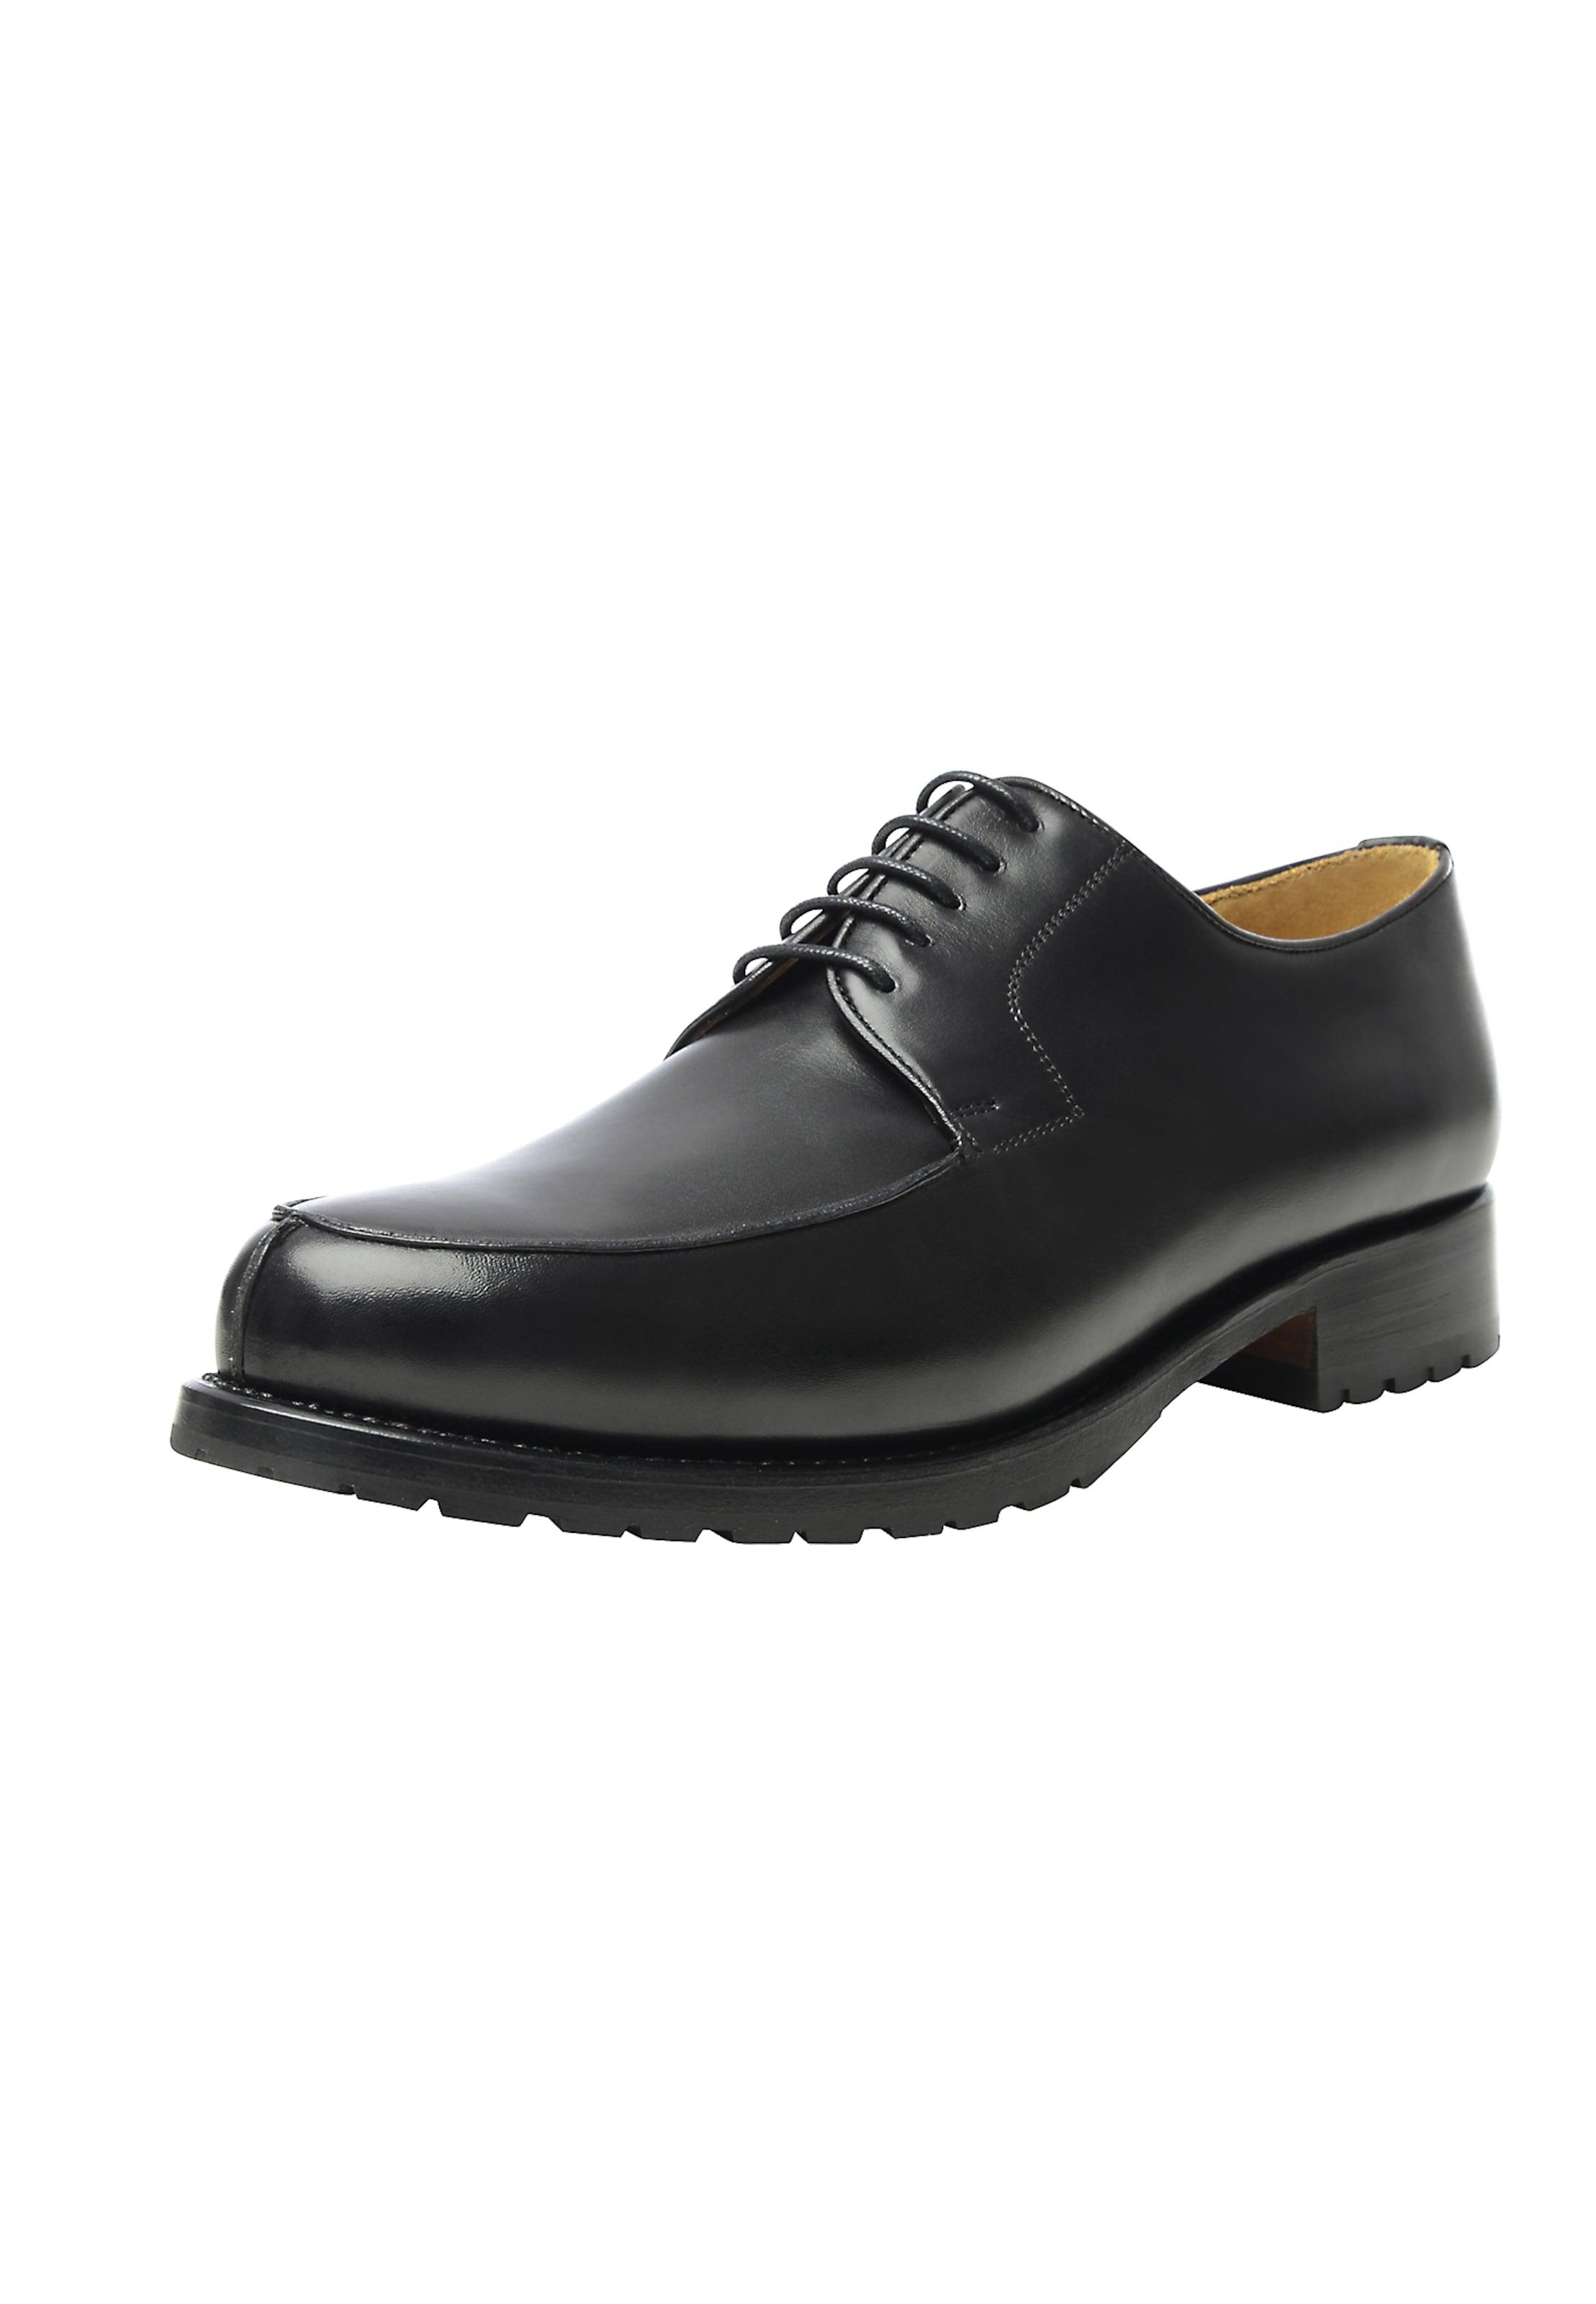 Haltbare Mode billige Schuhe SHOEPASSION | Businessschuhe 'No. 597' Schuhe Gut getragene Schuhe